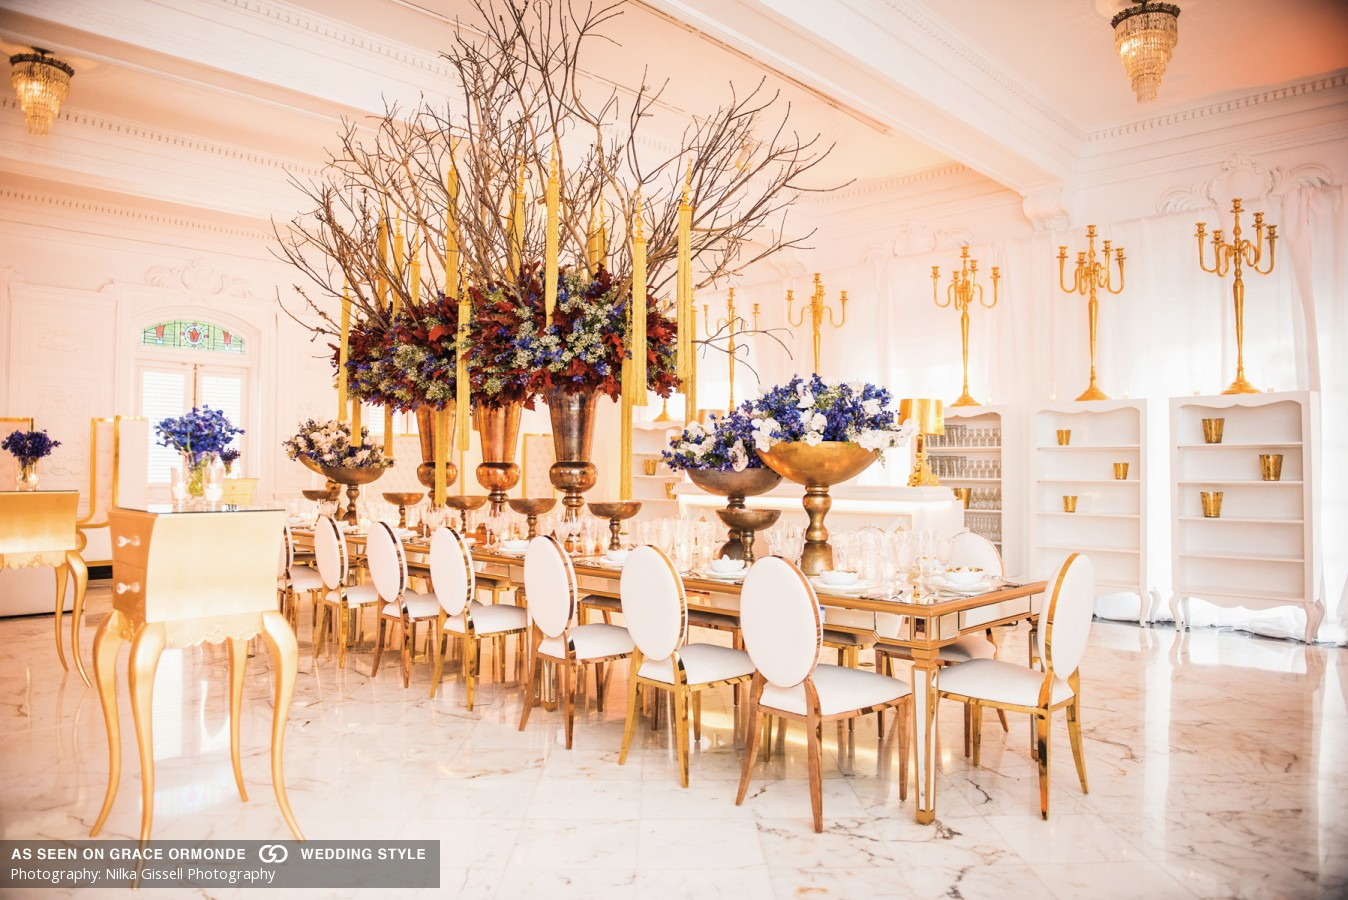 Centros de mesa Elegantes (1)